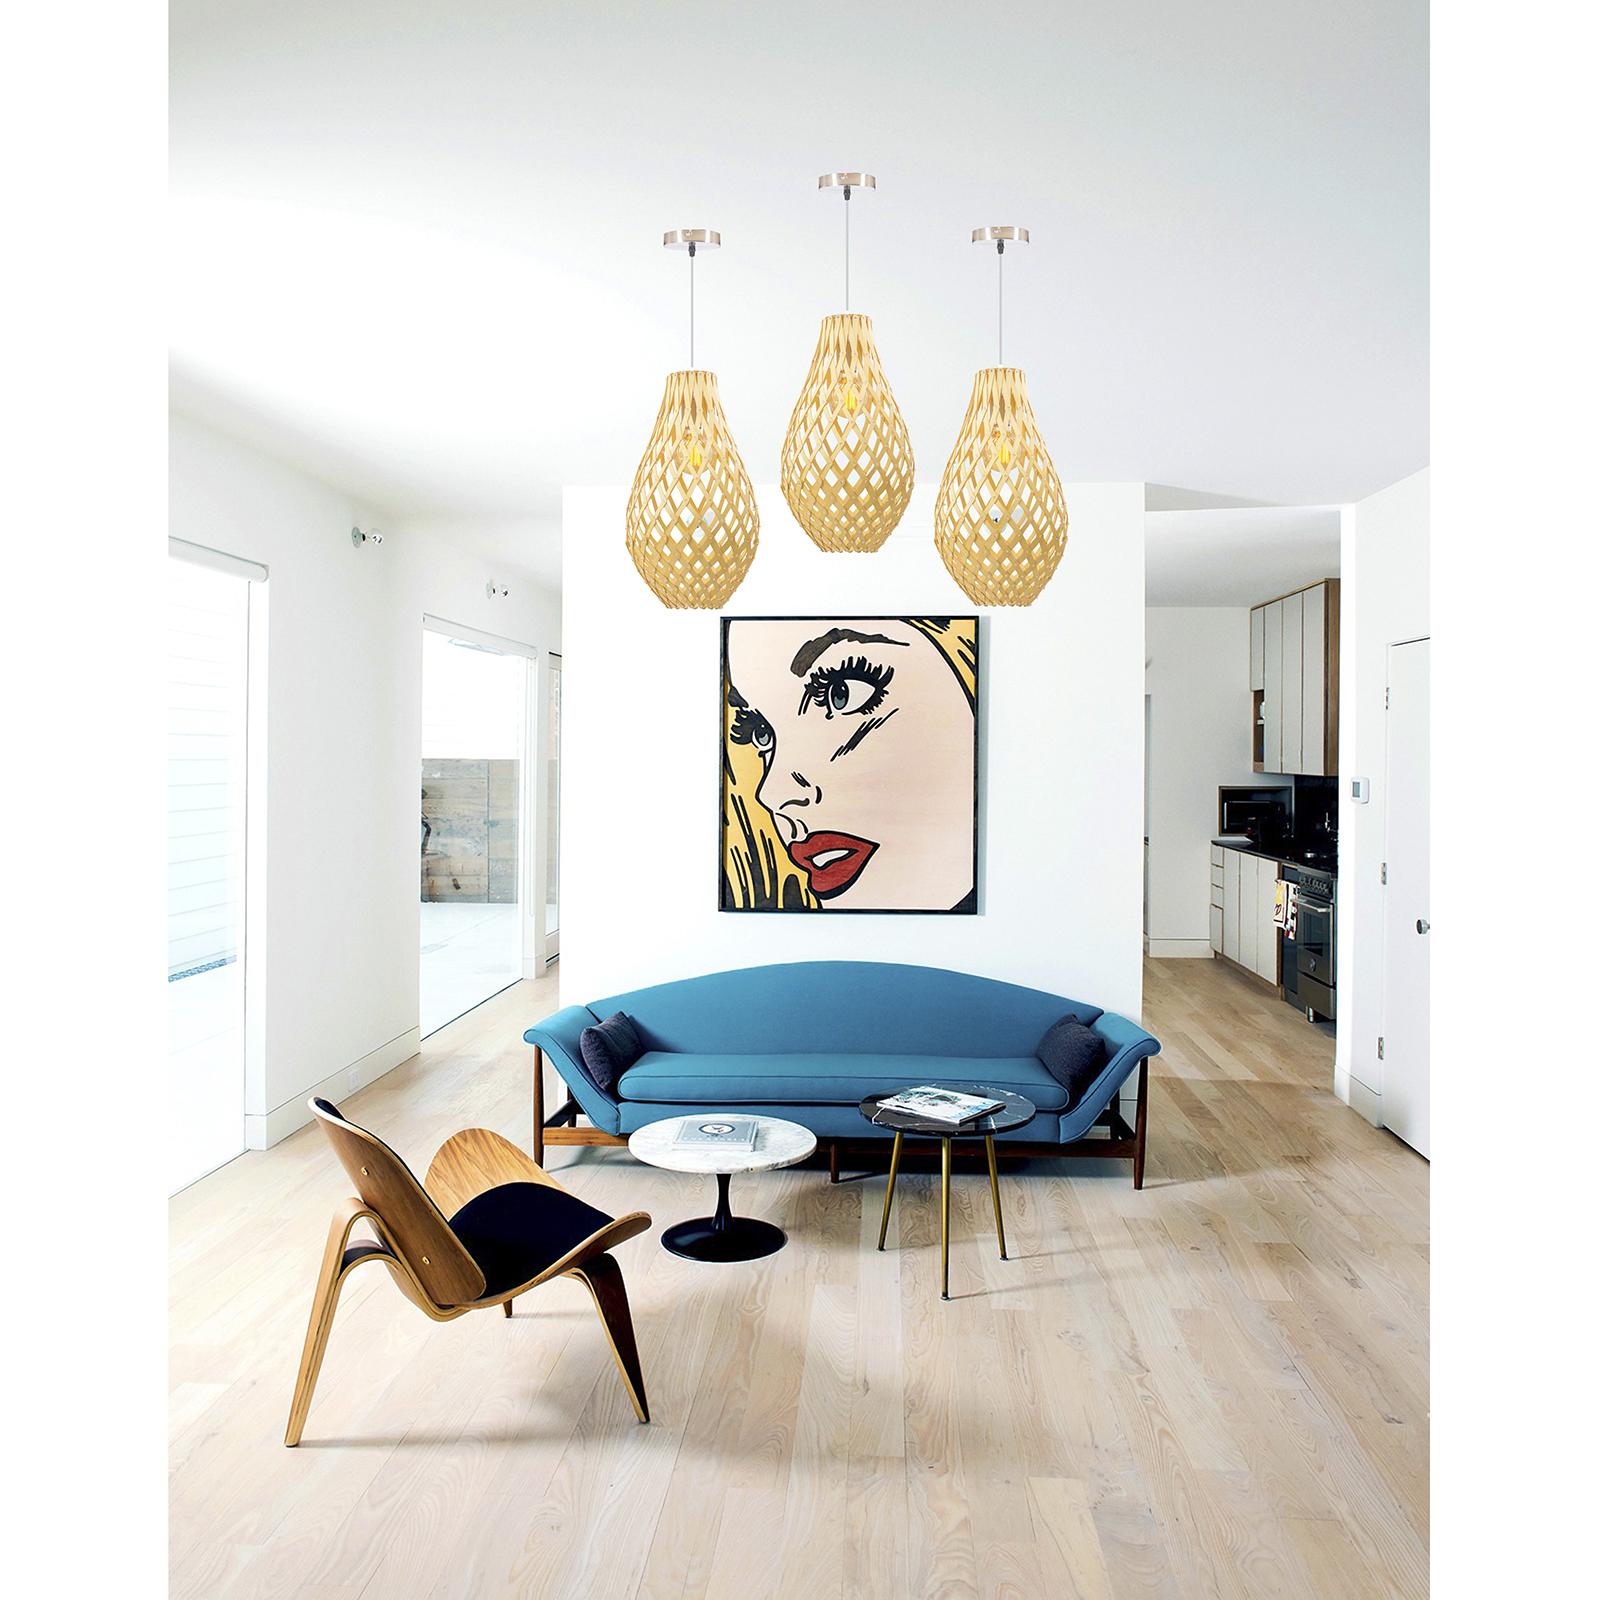 Wooden Handmade Pendant Light Natural Nordic Modern